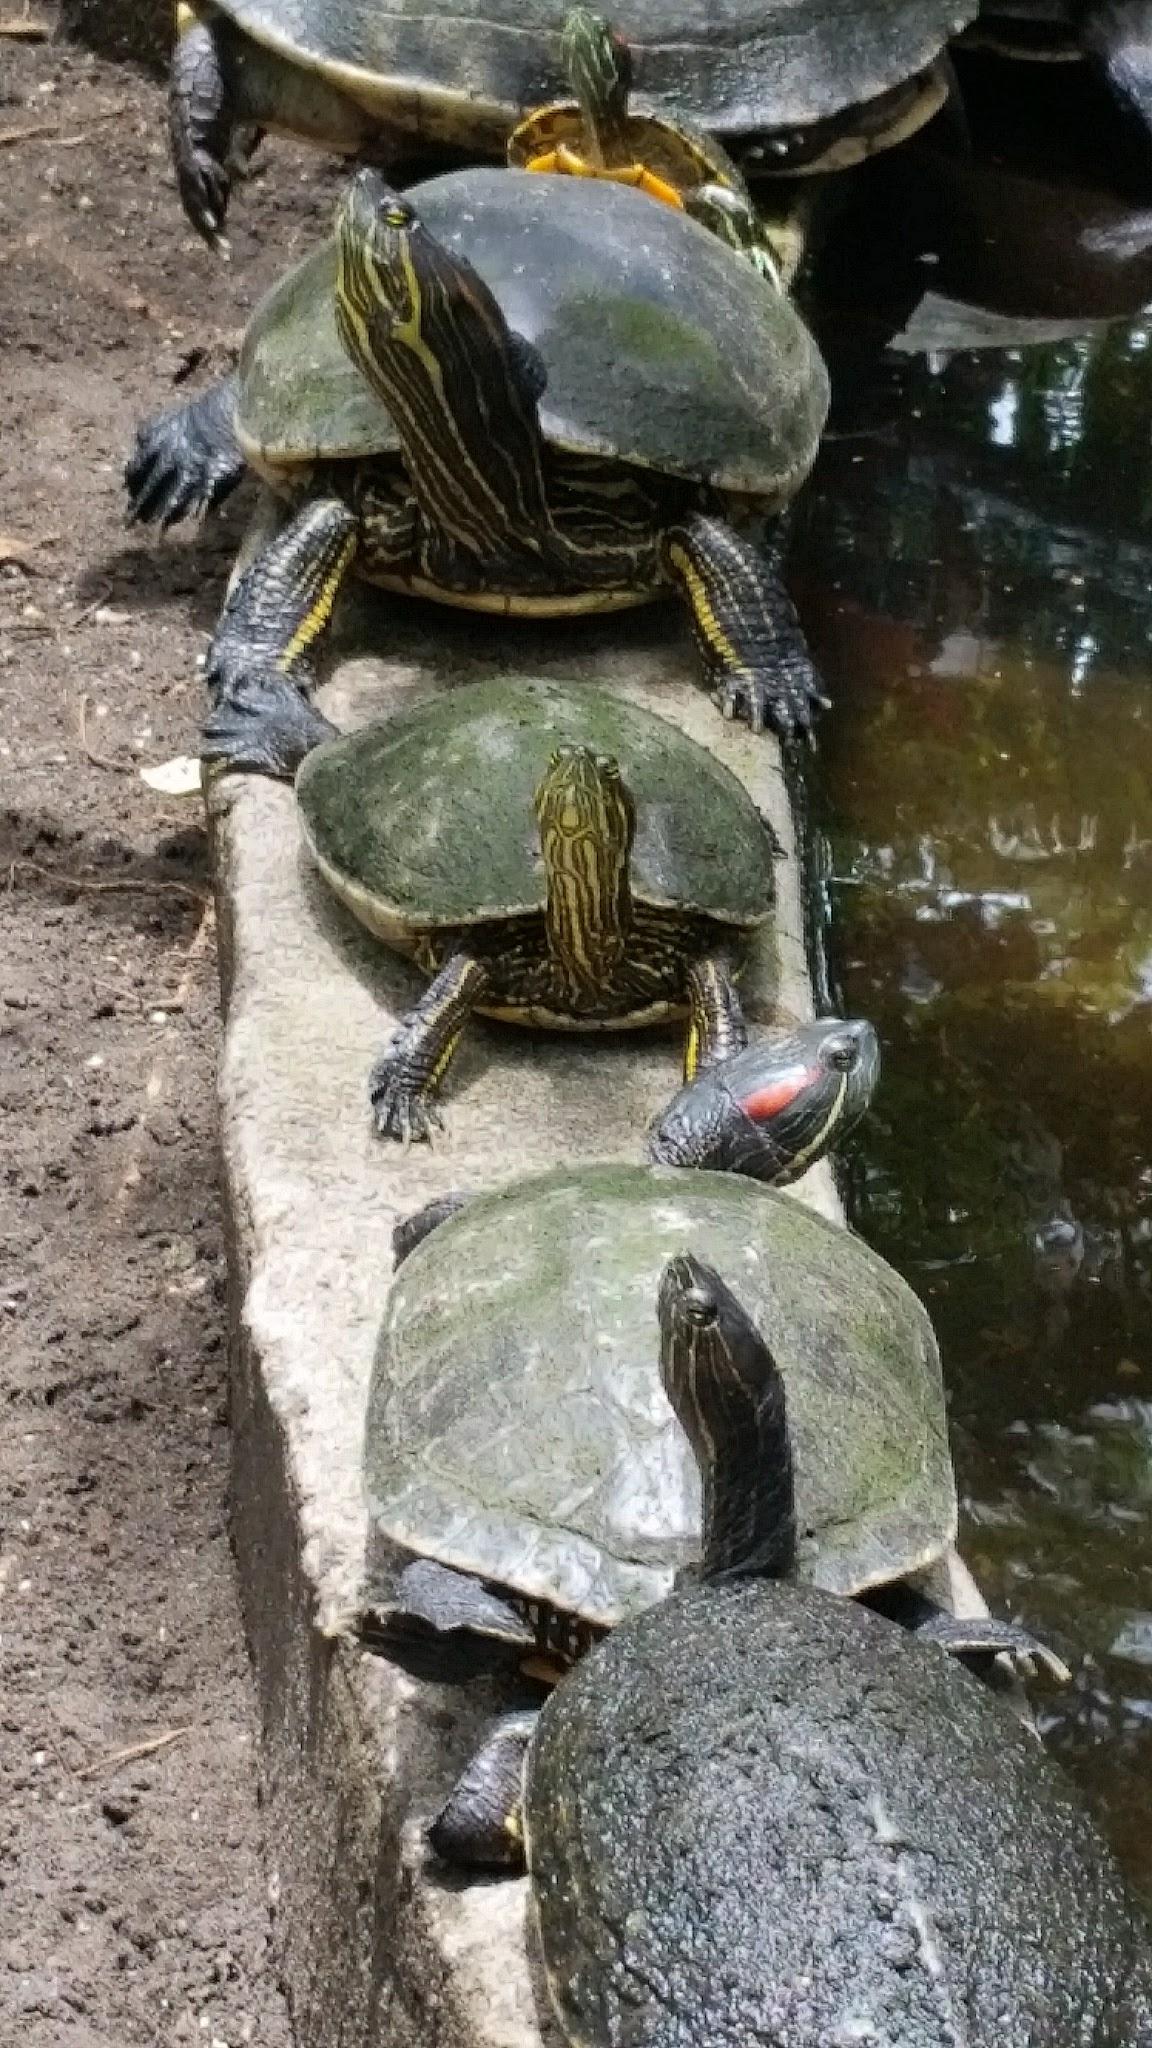 guatemala-monterrico-sea-turtle-conservation32